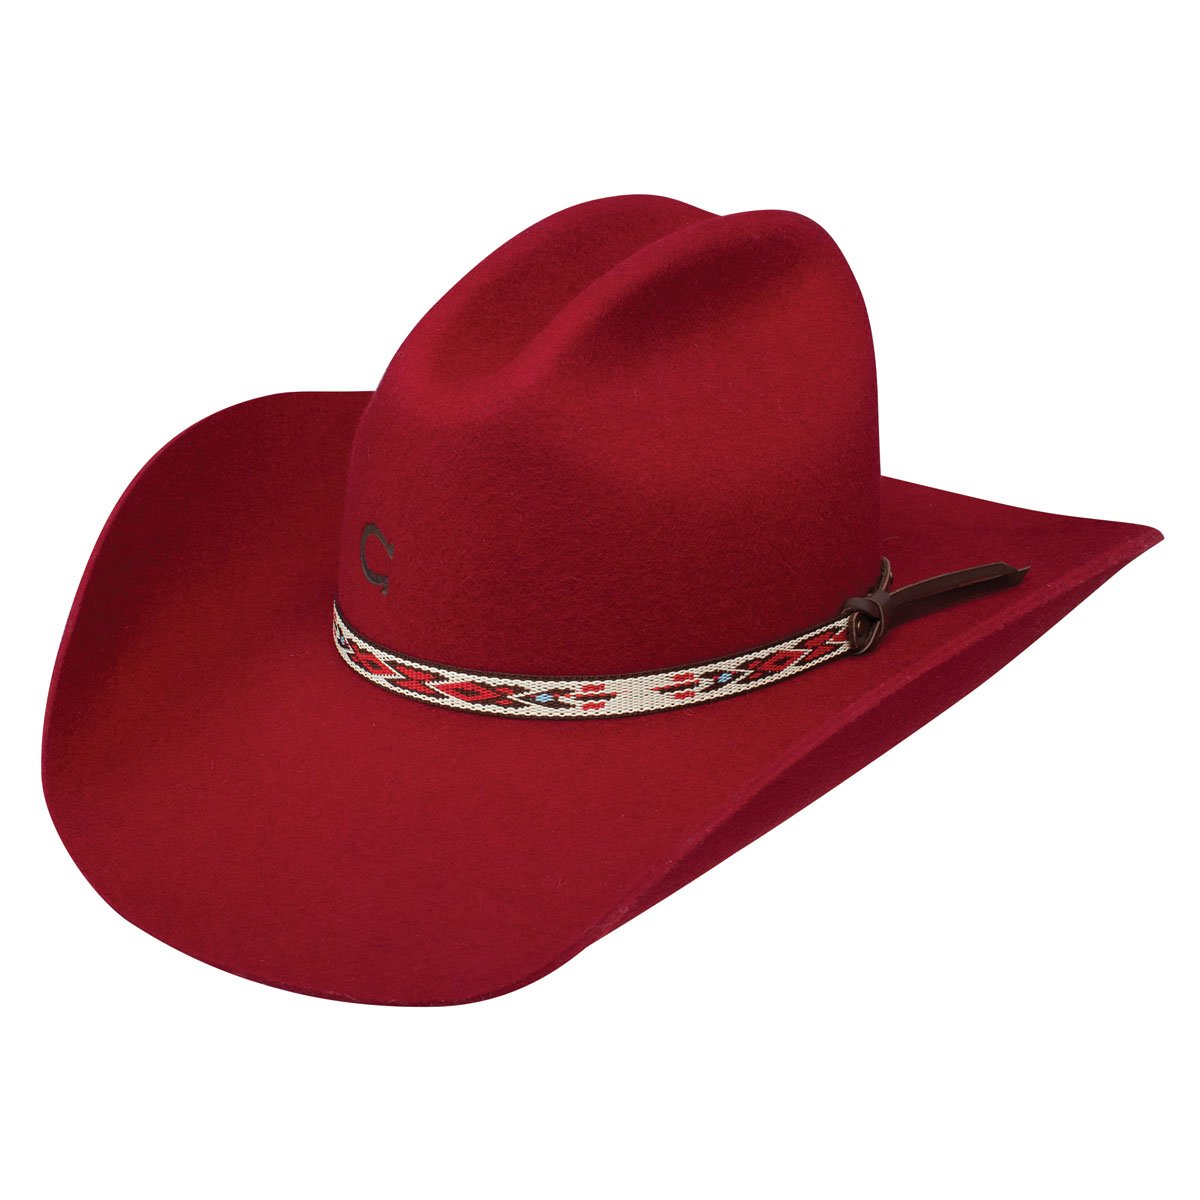 Charlie 1 Horse Red Rider Ladies' Hat (7)